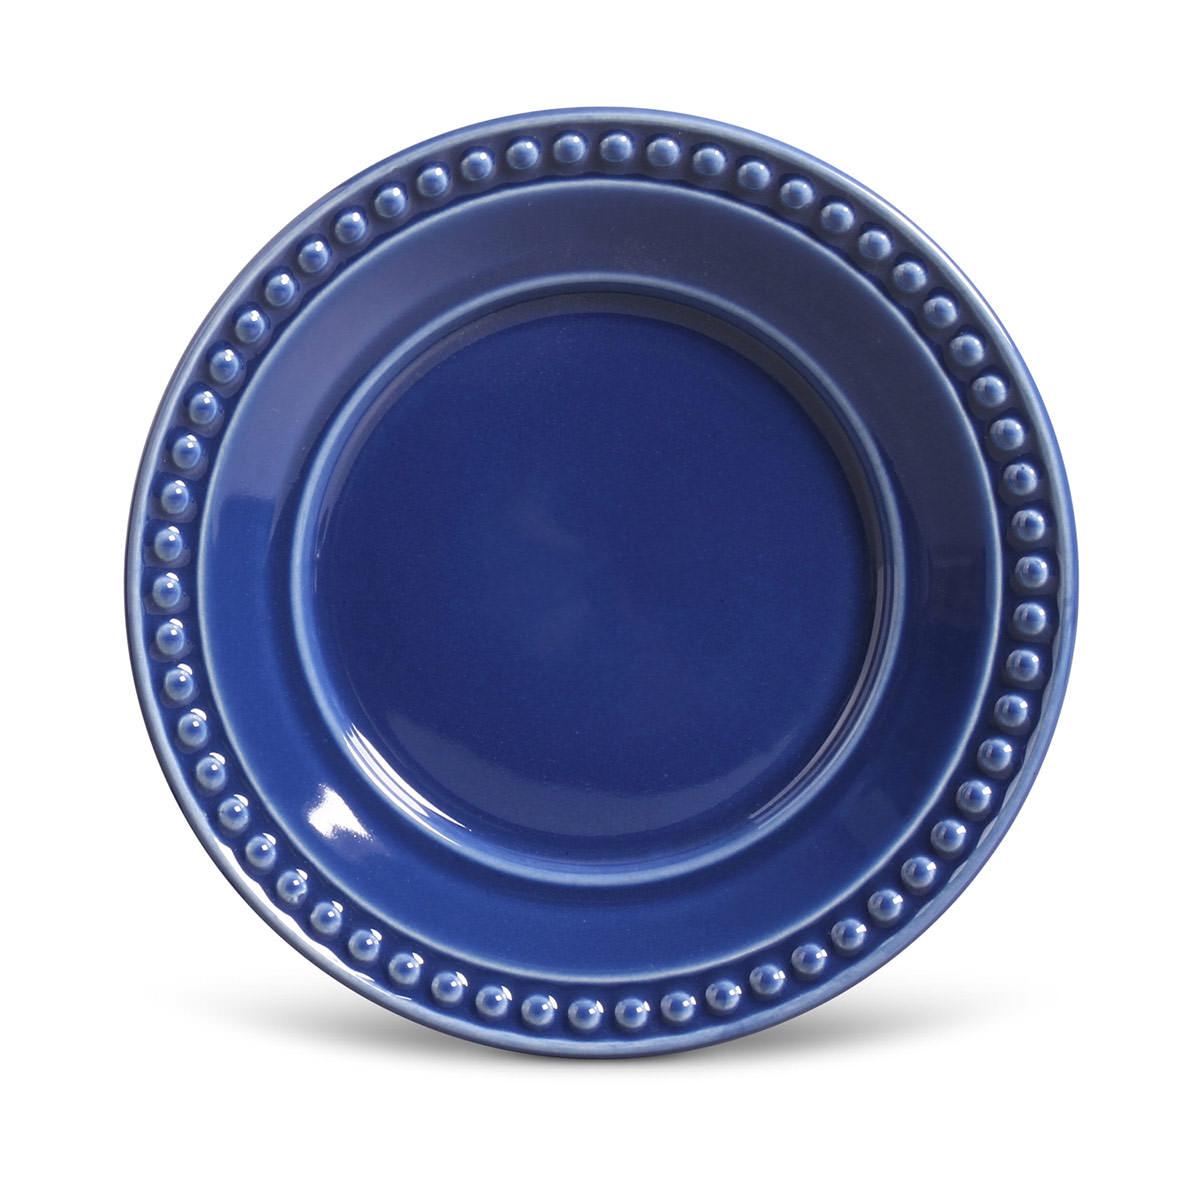 Prato de Sobremesa 01 Peça Atenas Azul Navy 20,5 cm Porto Brasil